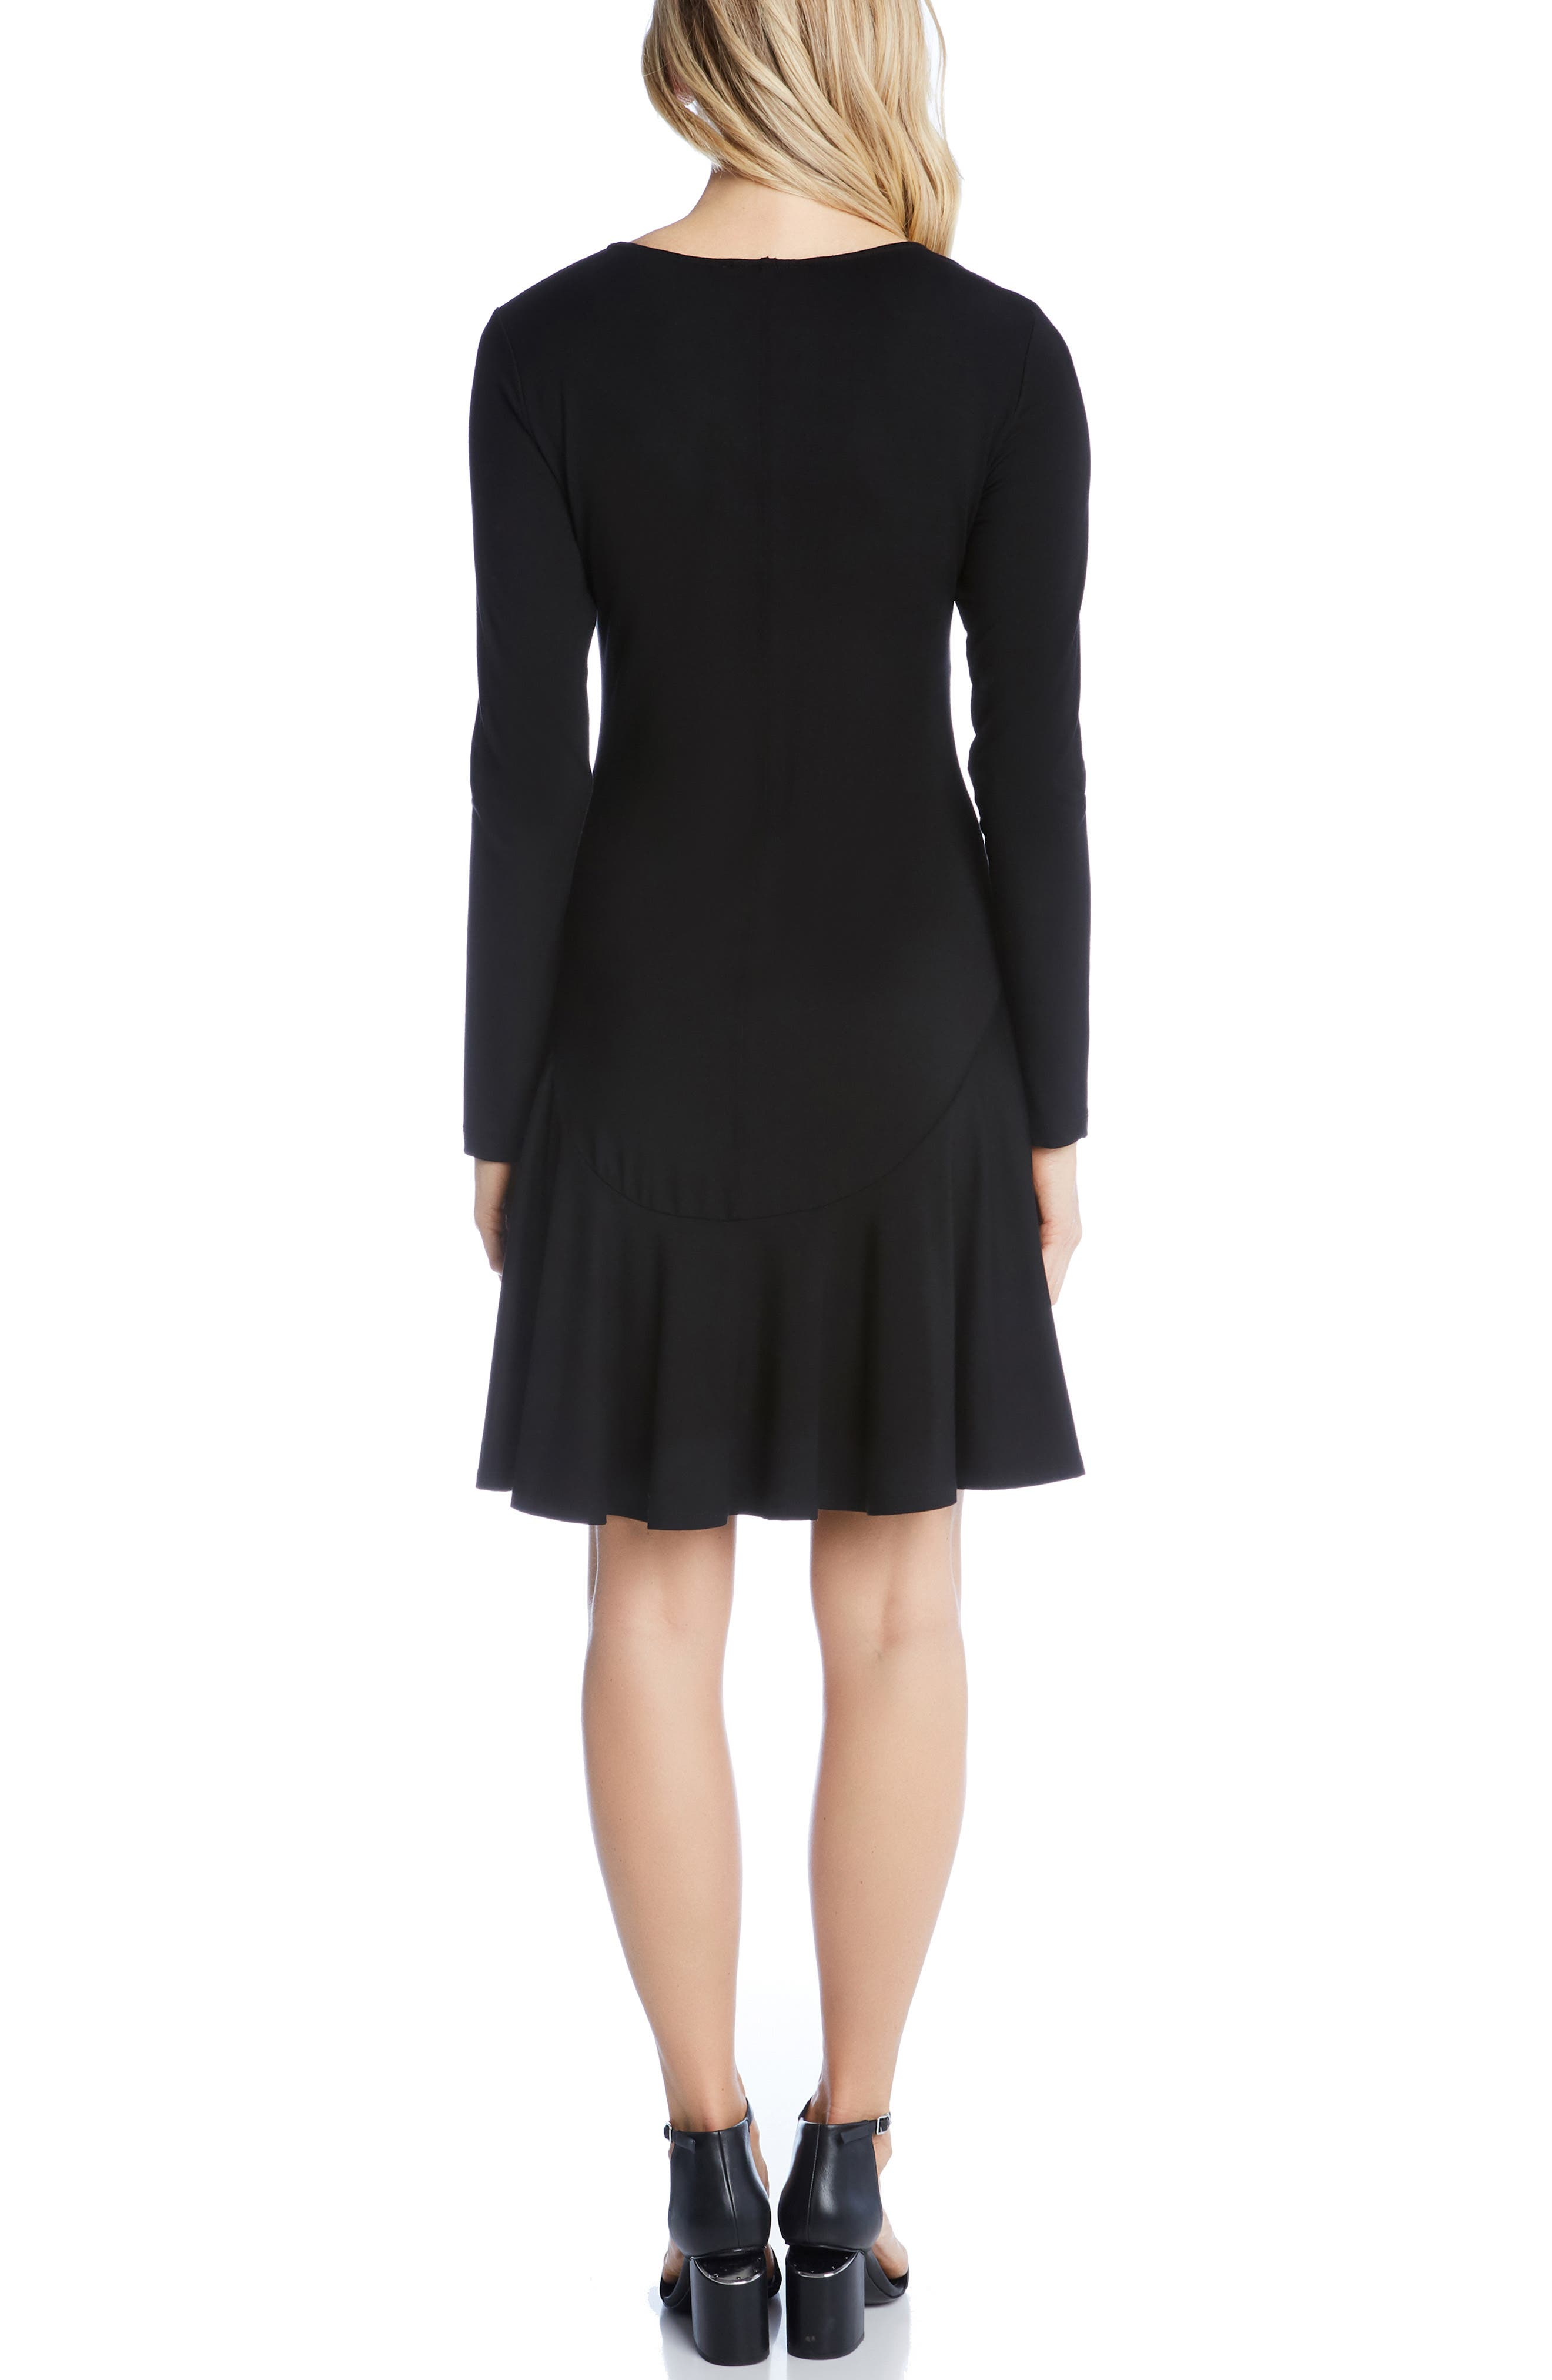 KAREN KANE, Dakota Ruffle Hem A-Line Dress, Alternate thumbnail 2, color, BLACK